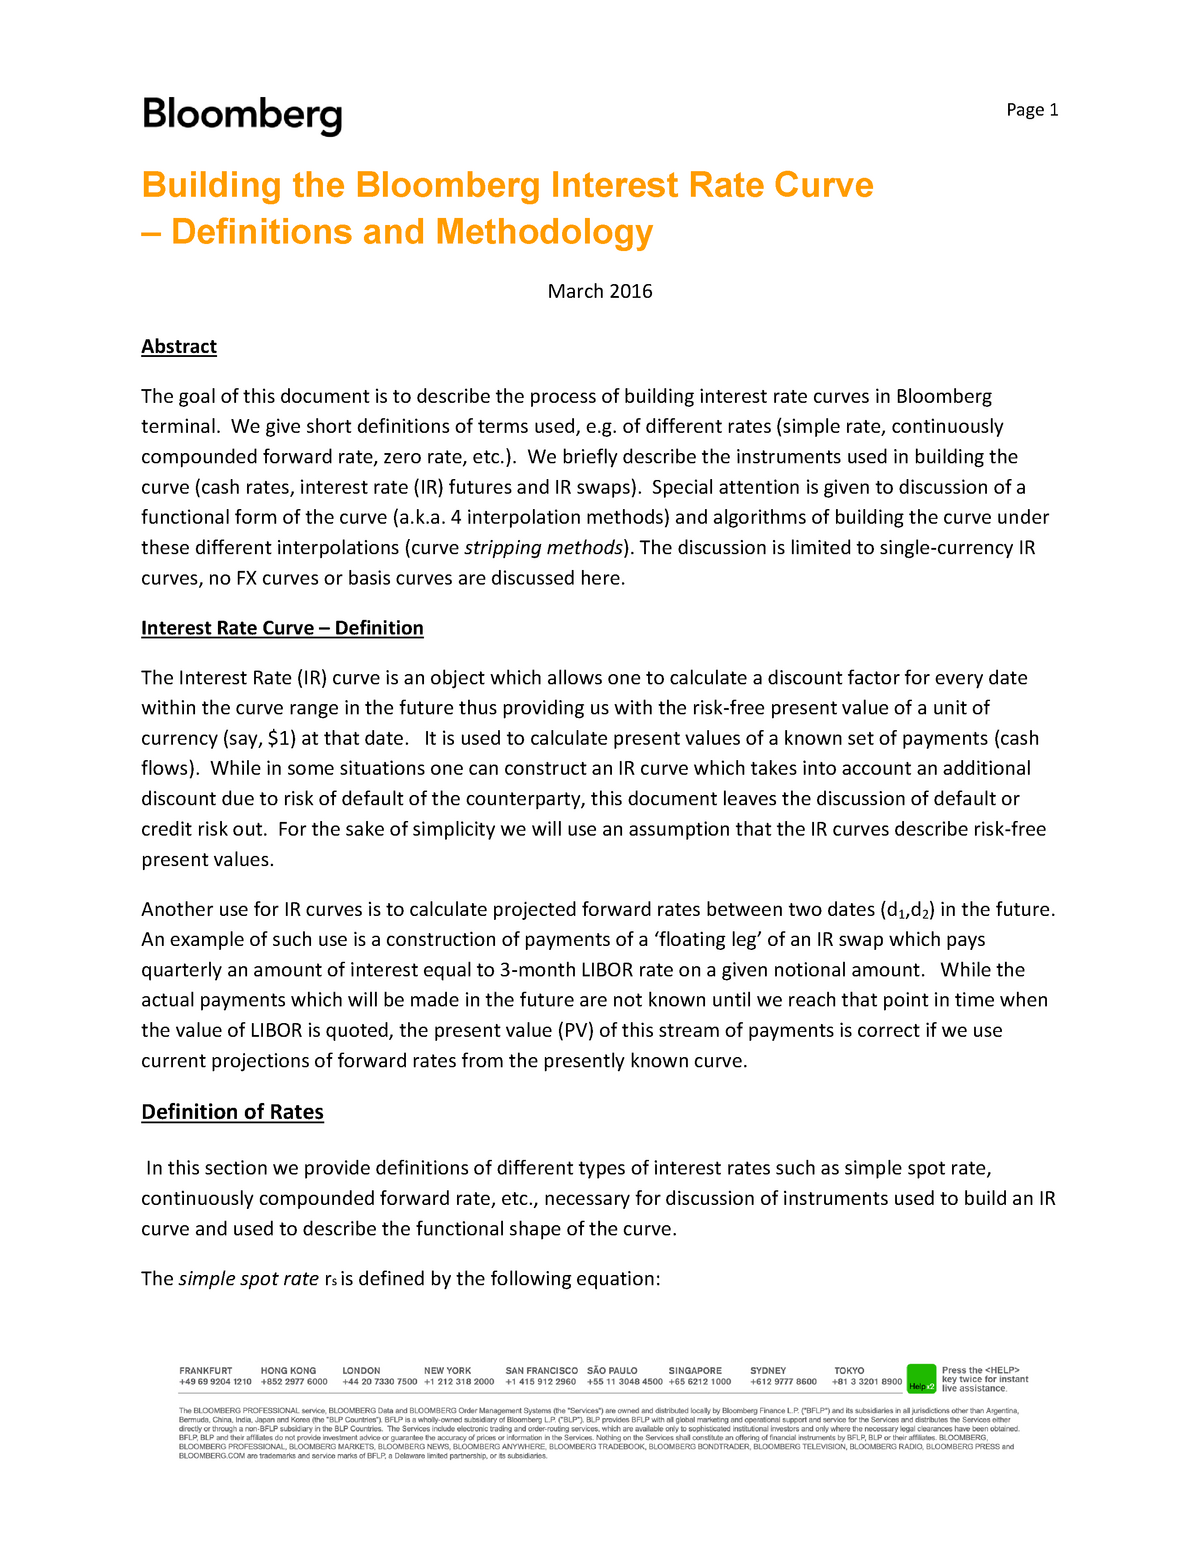 Bloomberg method - Behavioral Finance BA-BHAAV2389U - CBS